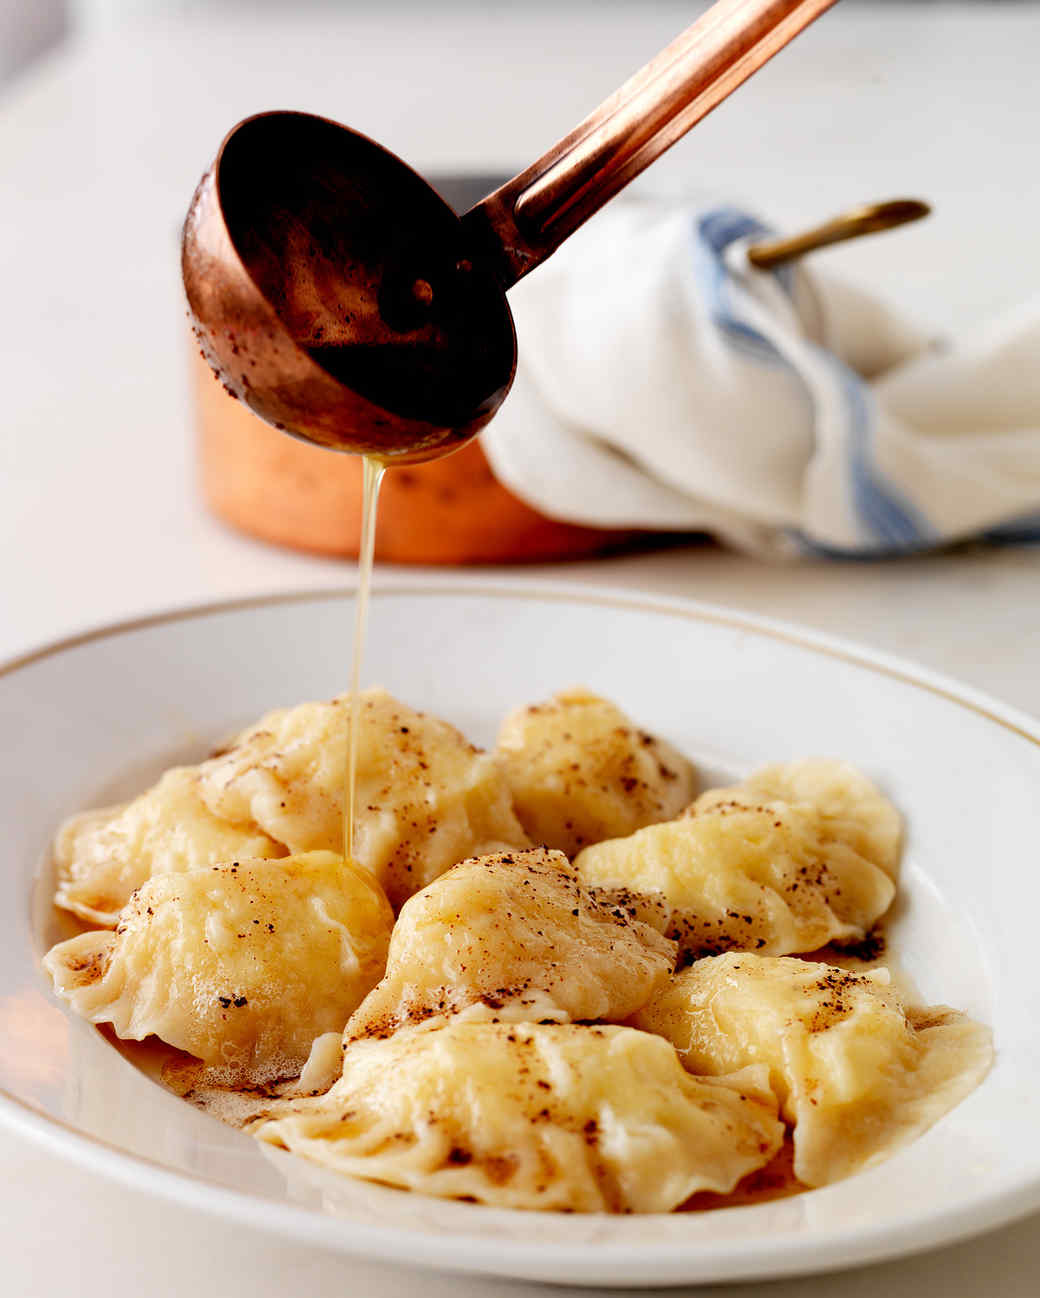 pierogis with sauce